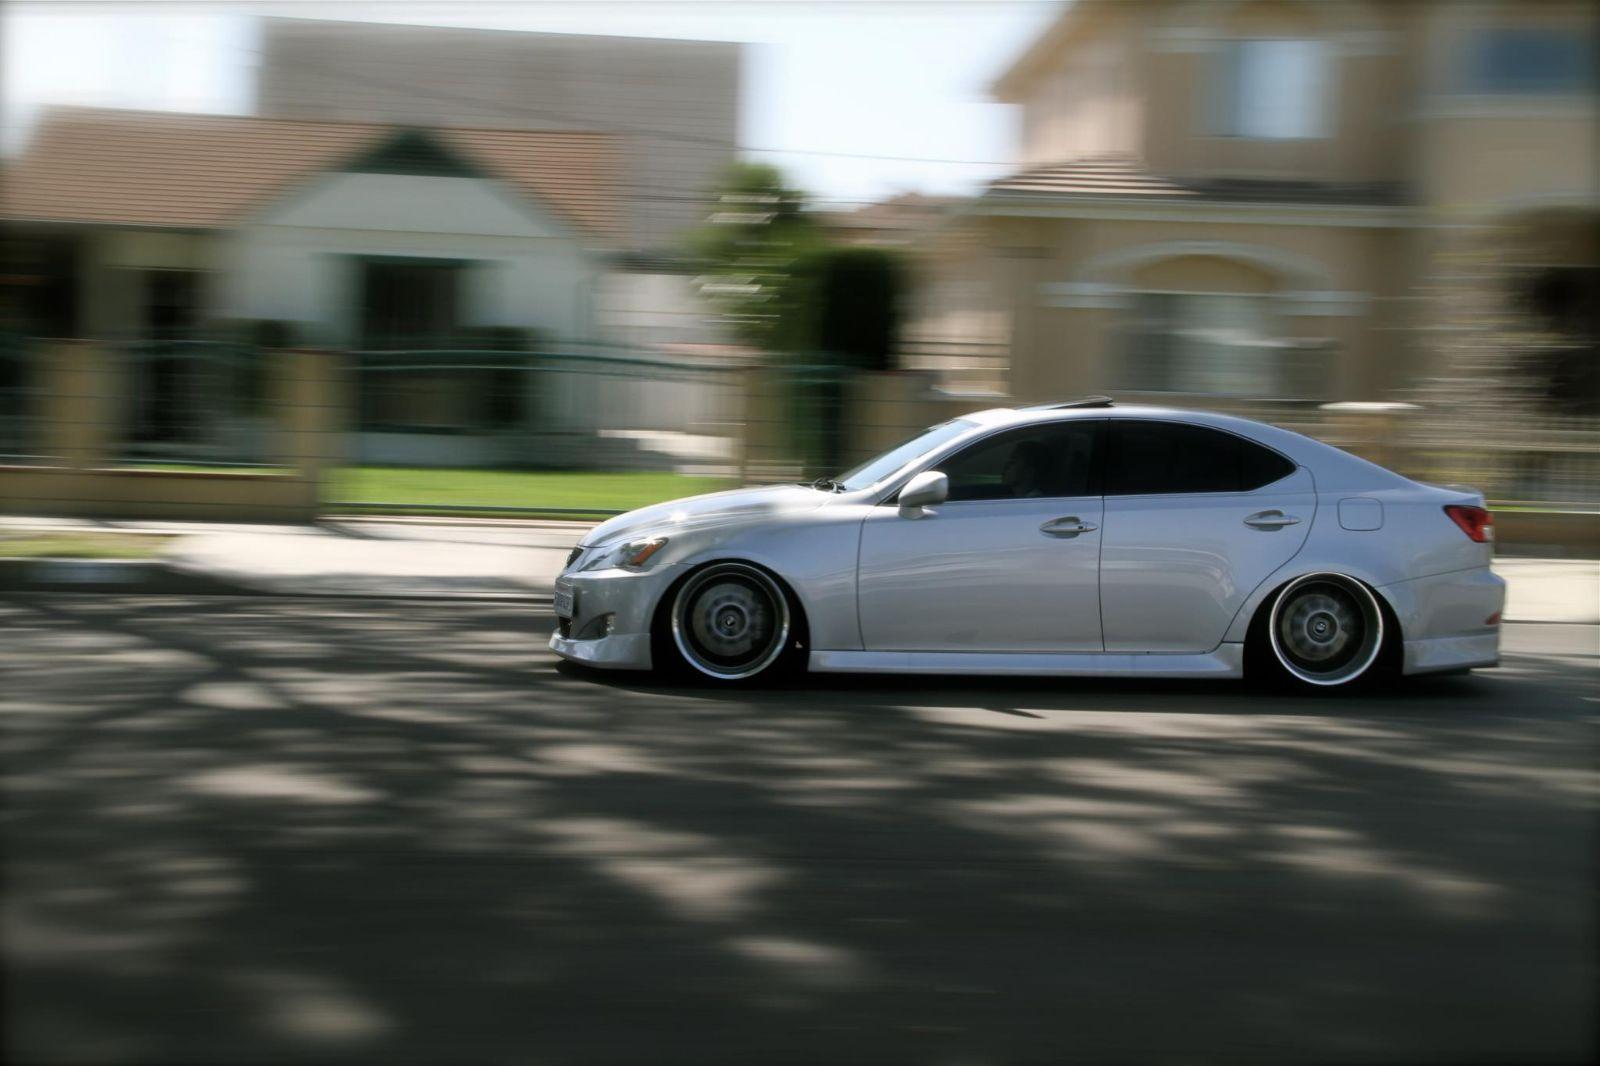 http://img.modifiedcartrader.com/uploaded/XL/2012/11/Lexus-IS-350-for-sale-custom-32040-944954.jpg